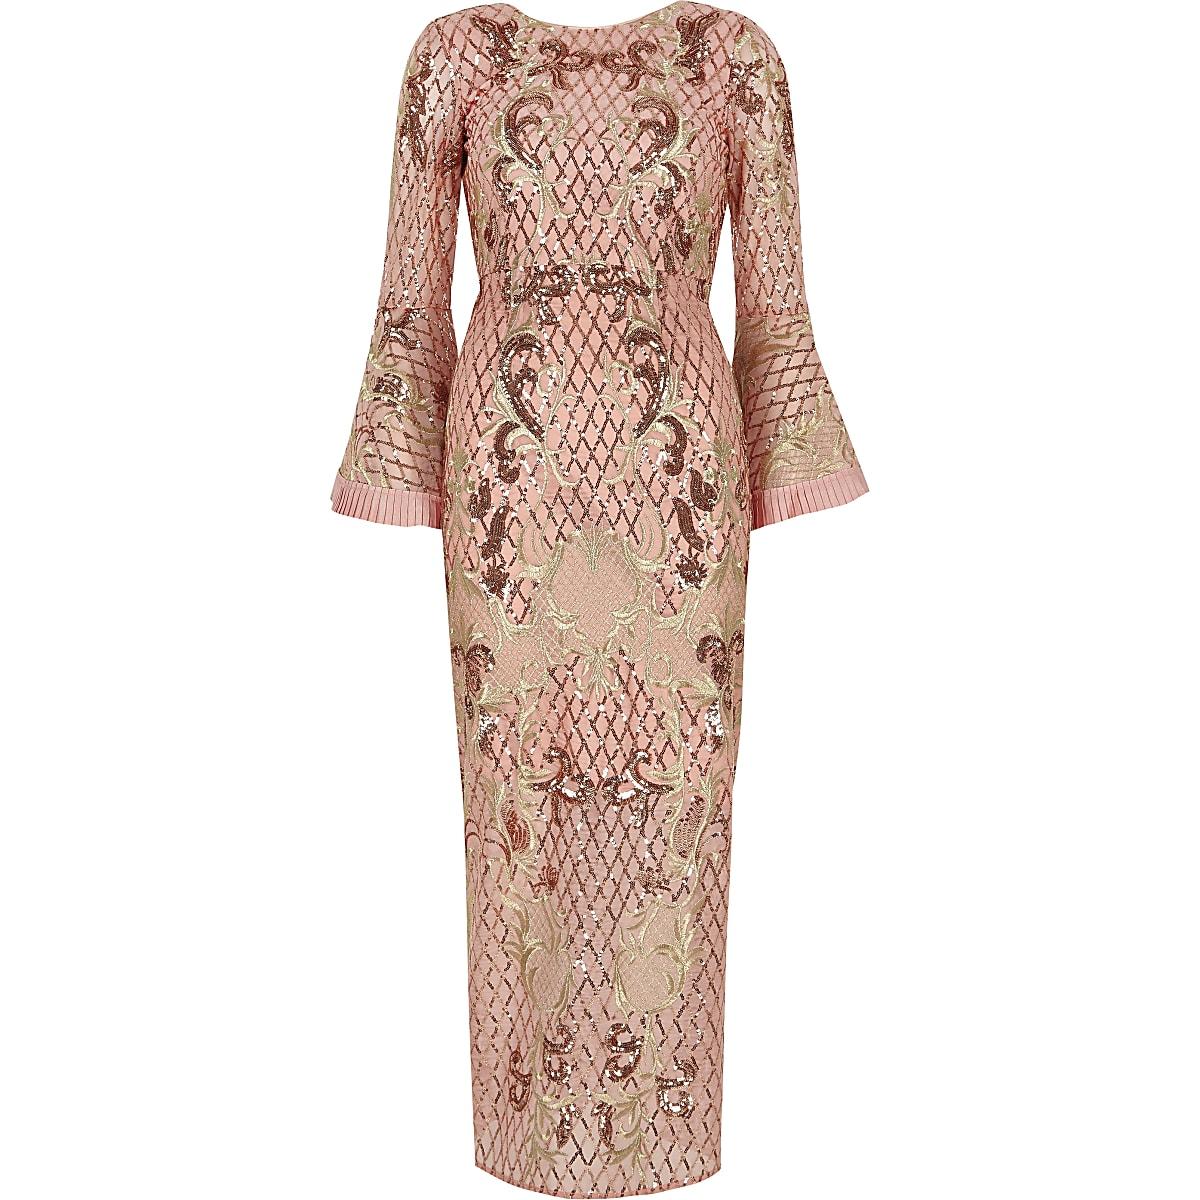 86e592c3bedb72 RI Petite - Roze verfraaide maxi-jurk met pailletten voor meisjes ...